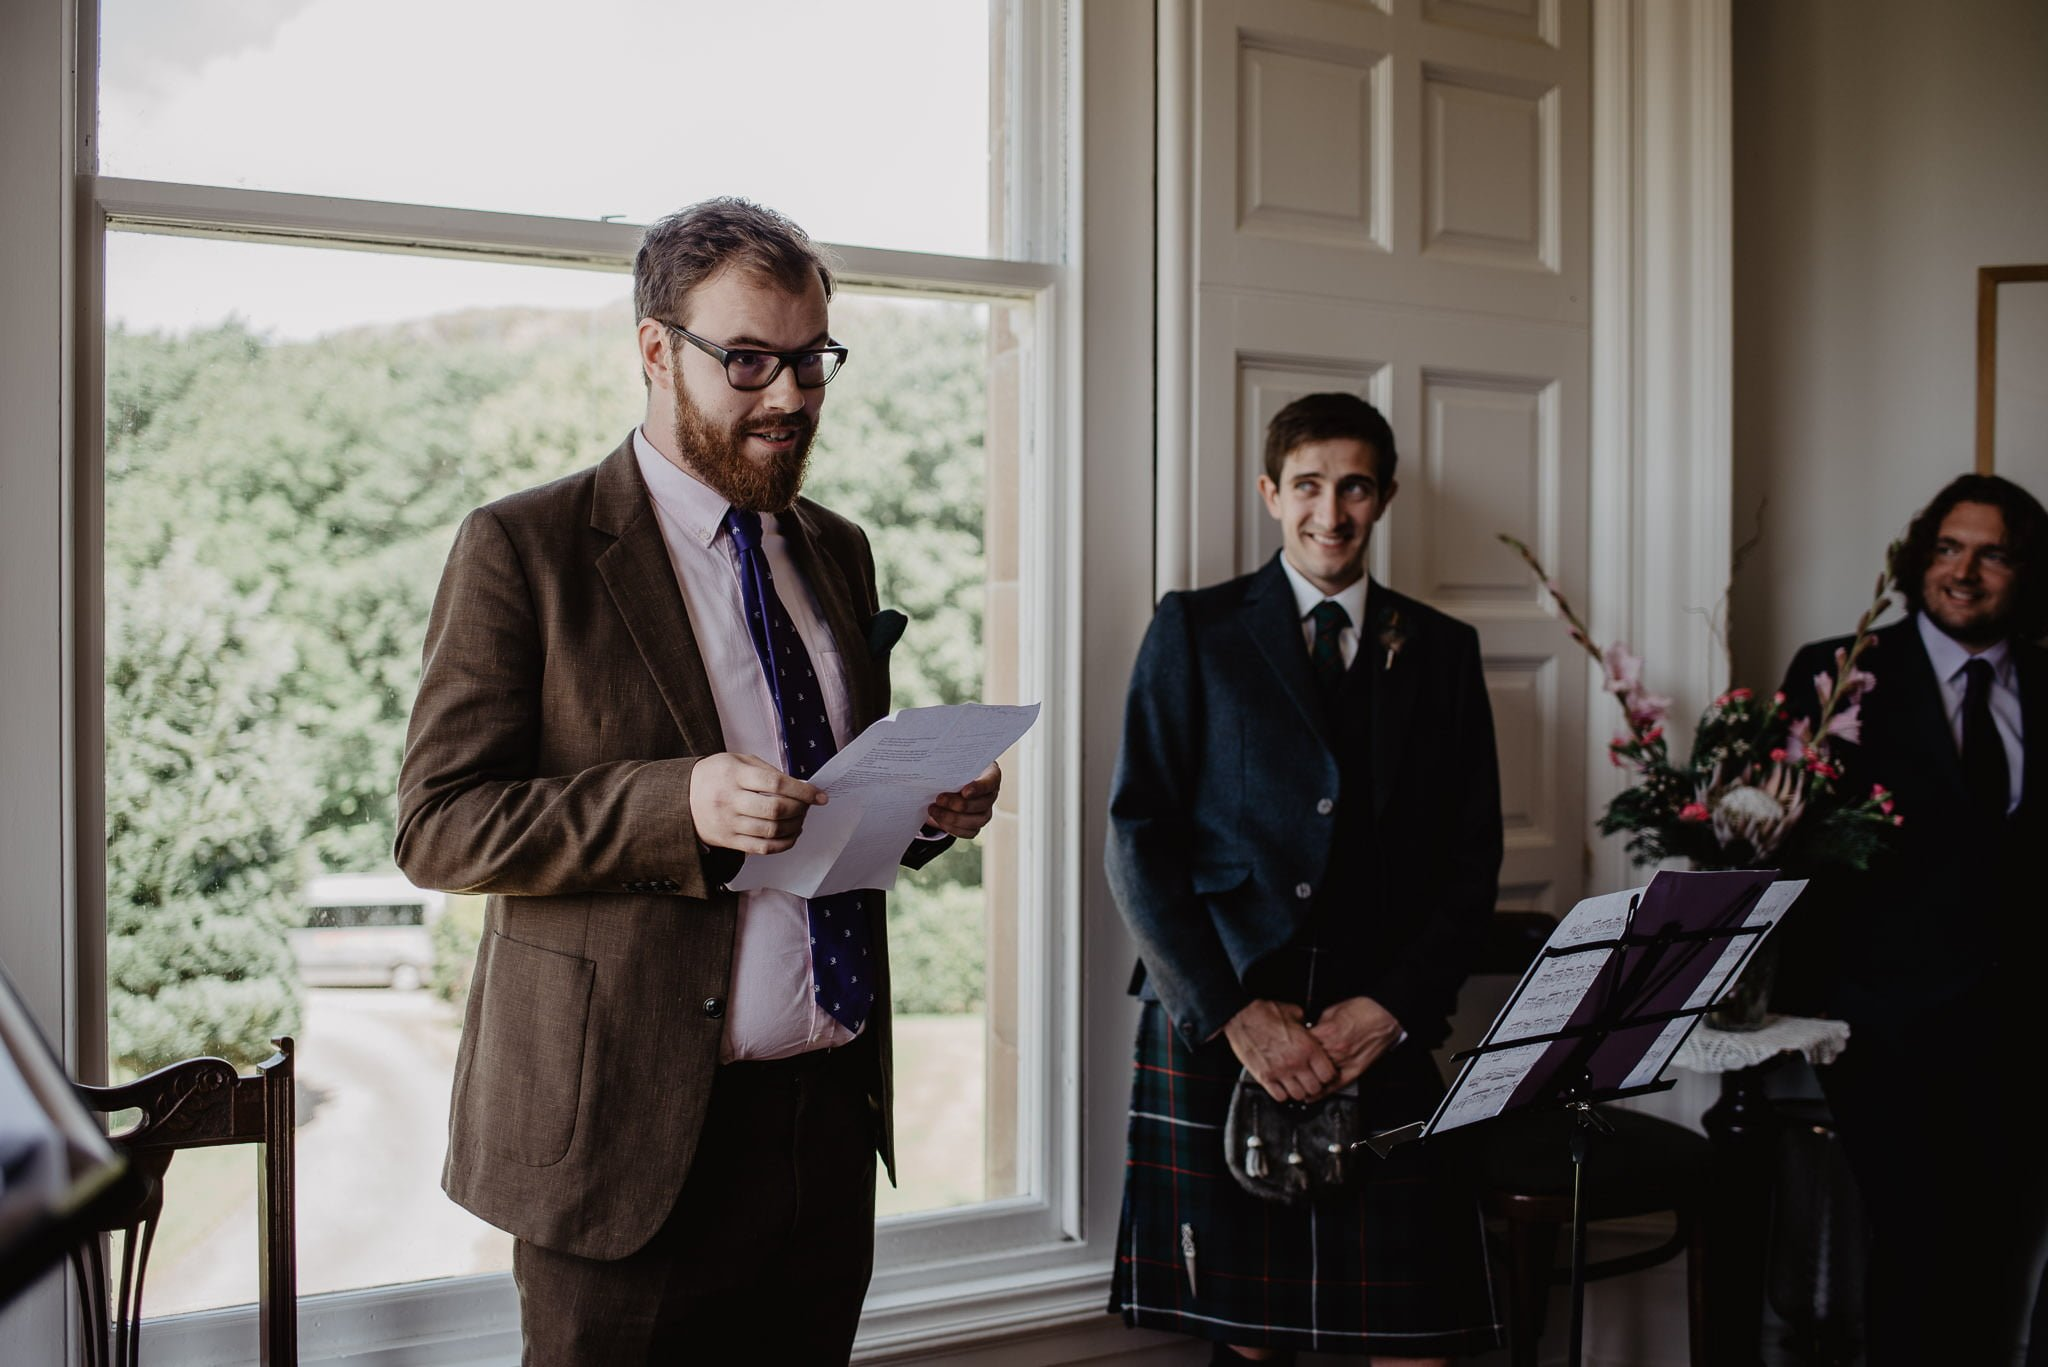 An Italian inspired wedding at Balinakill House 27